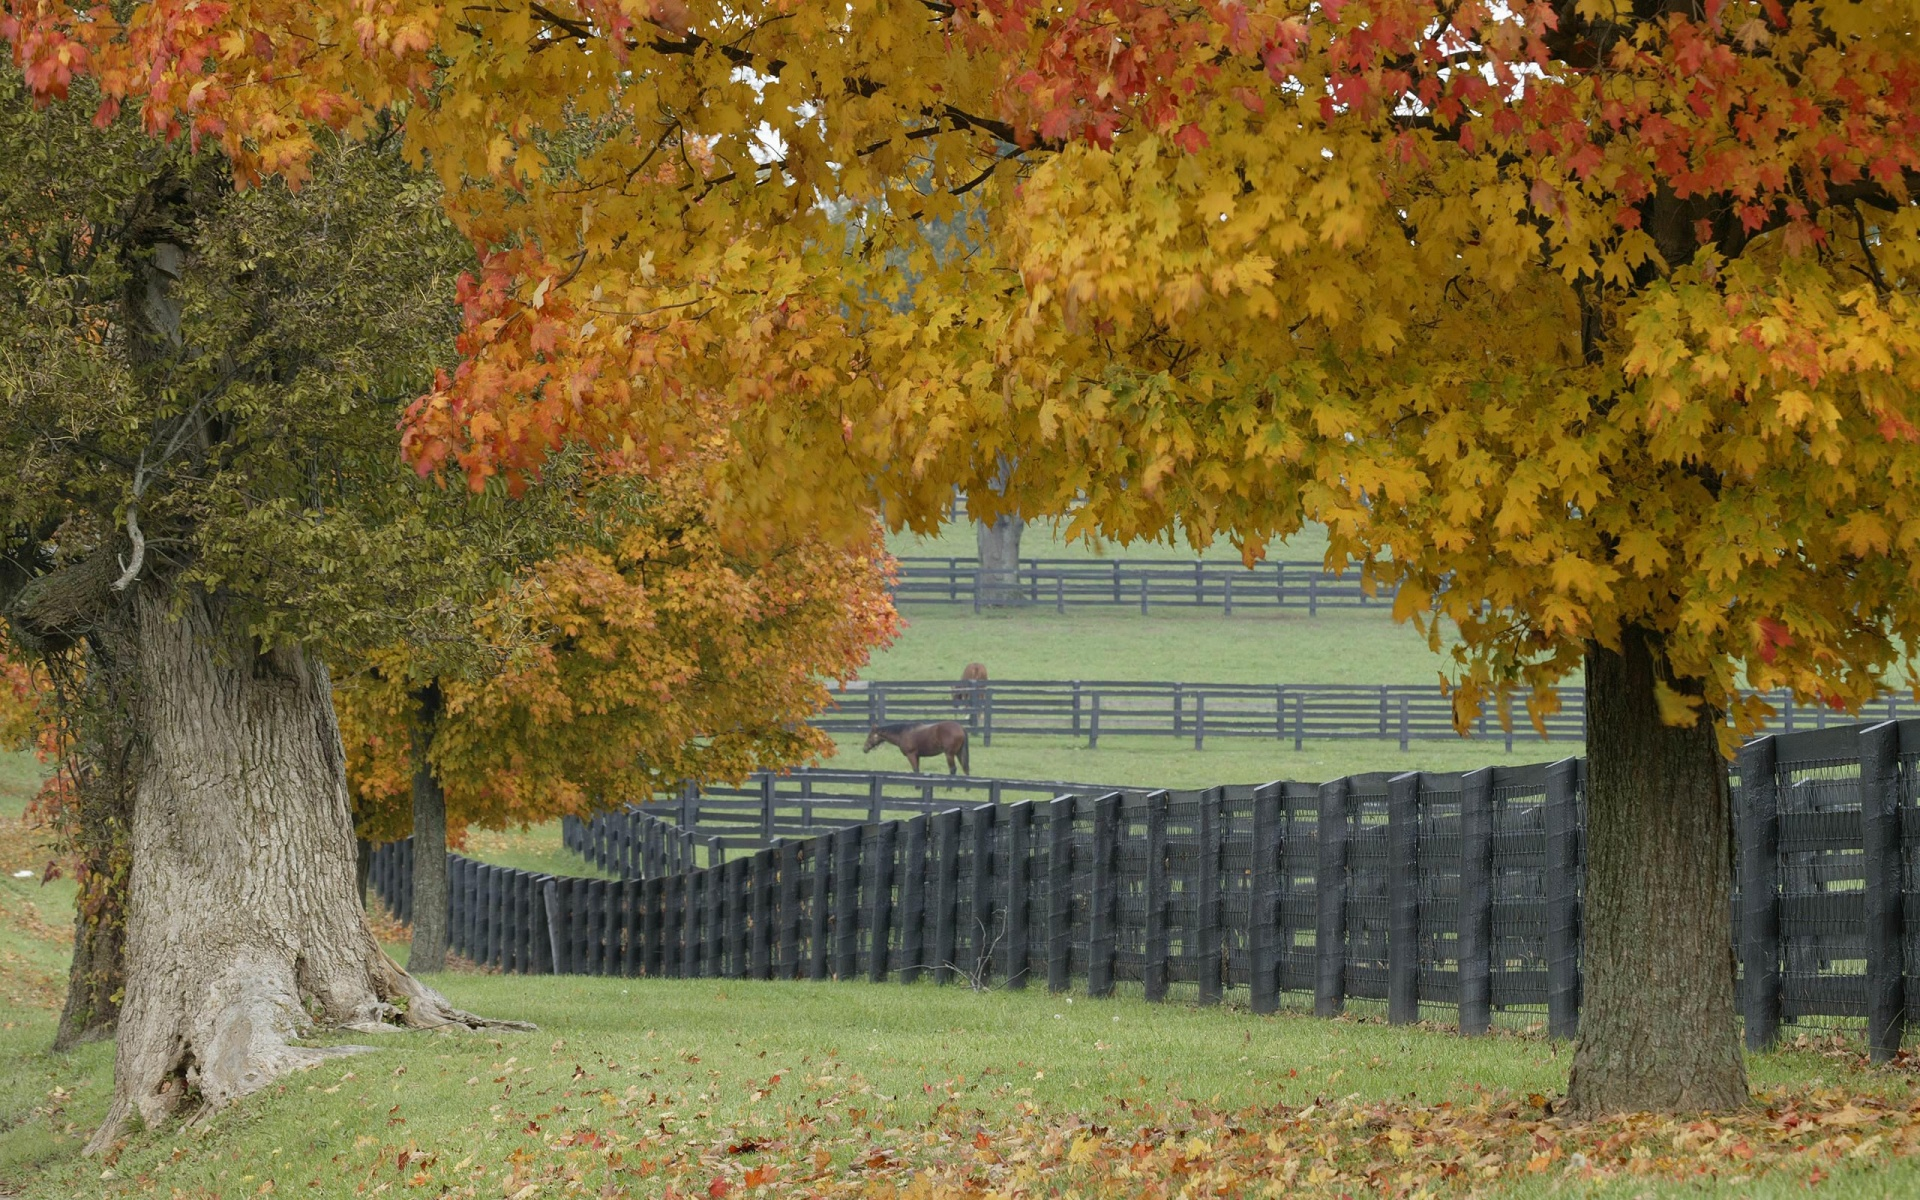 Farm Wallpaper 7020676 1920x1200